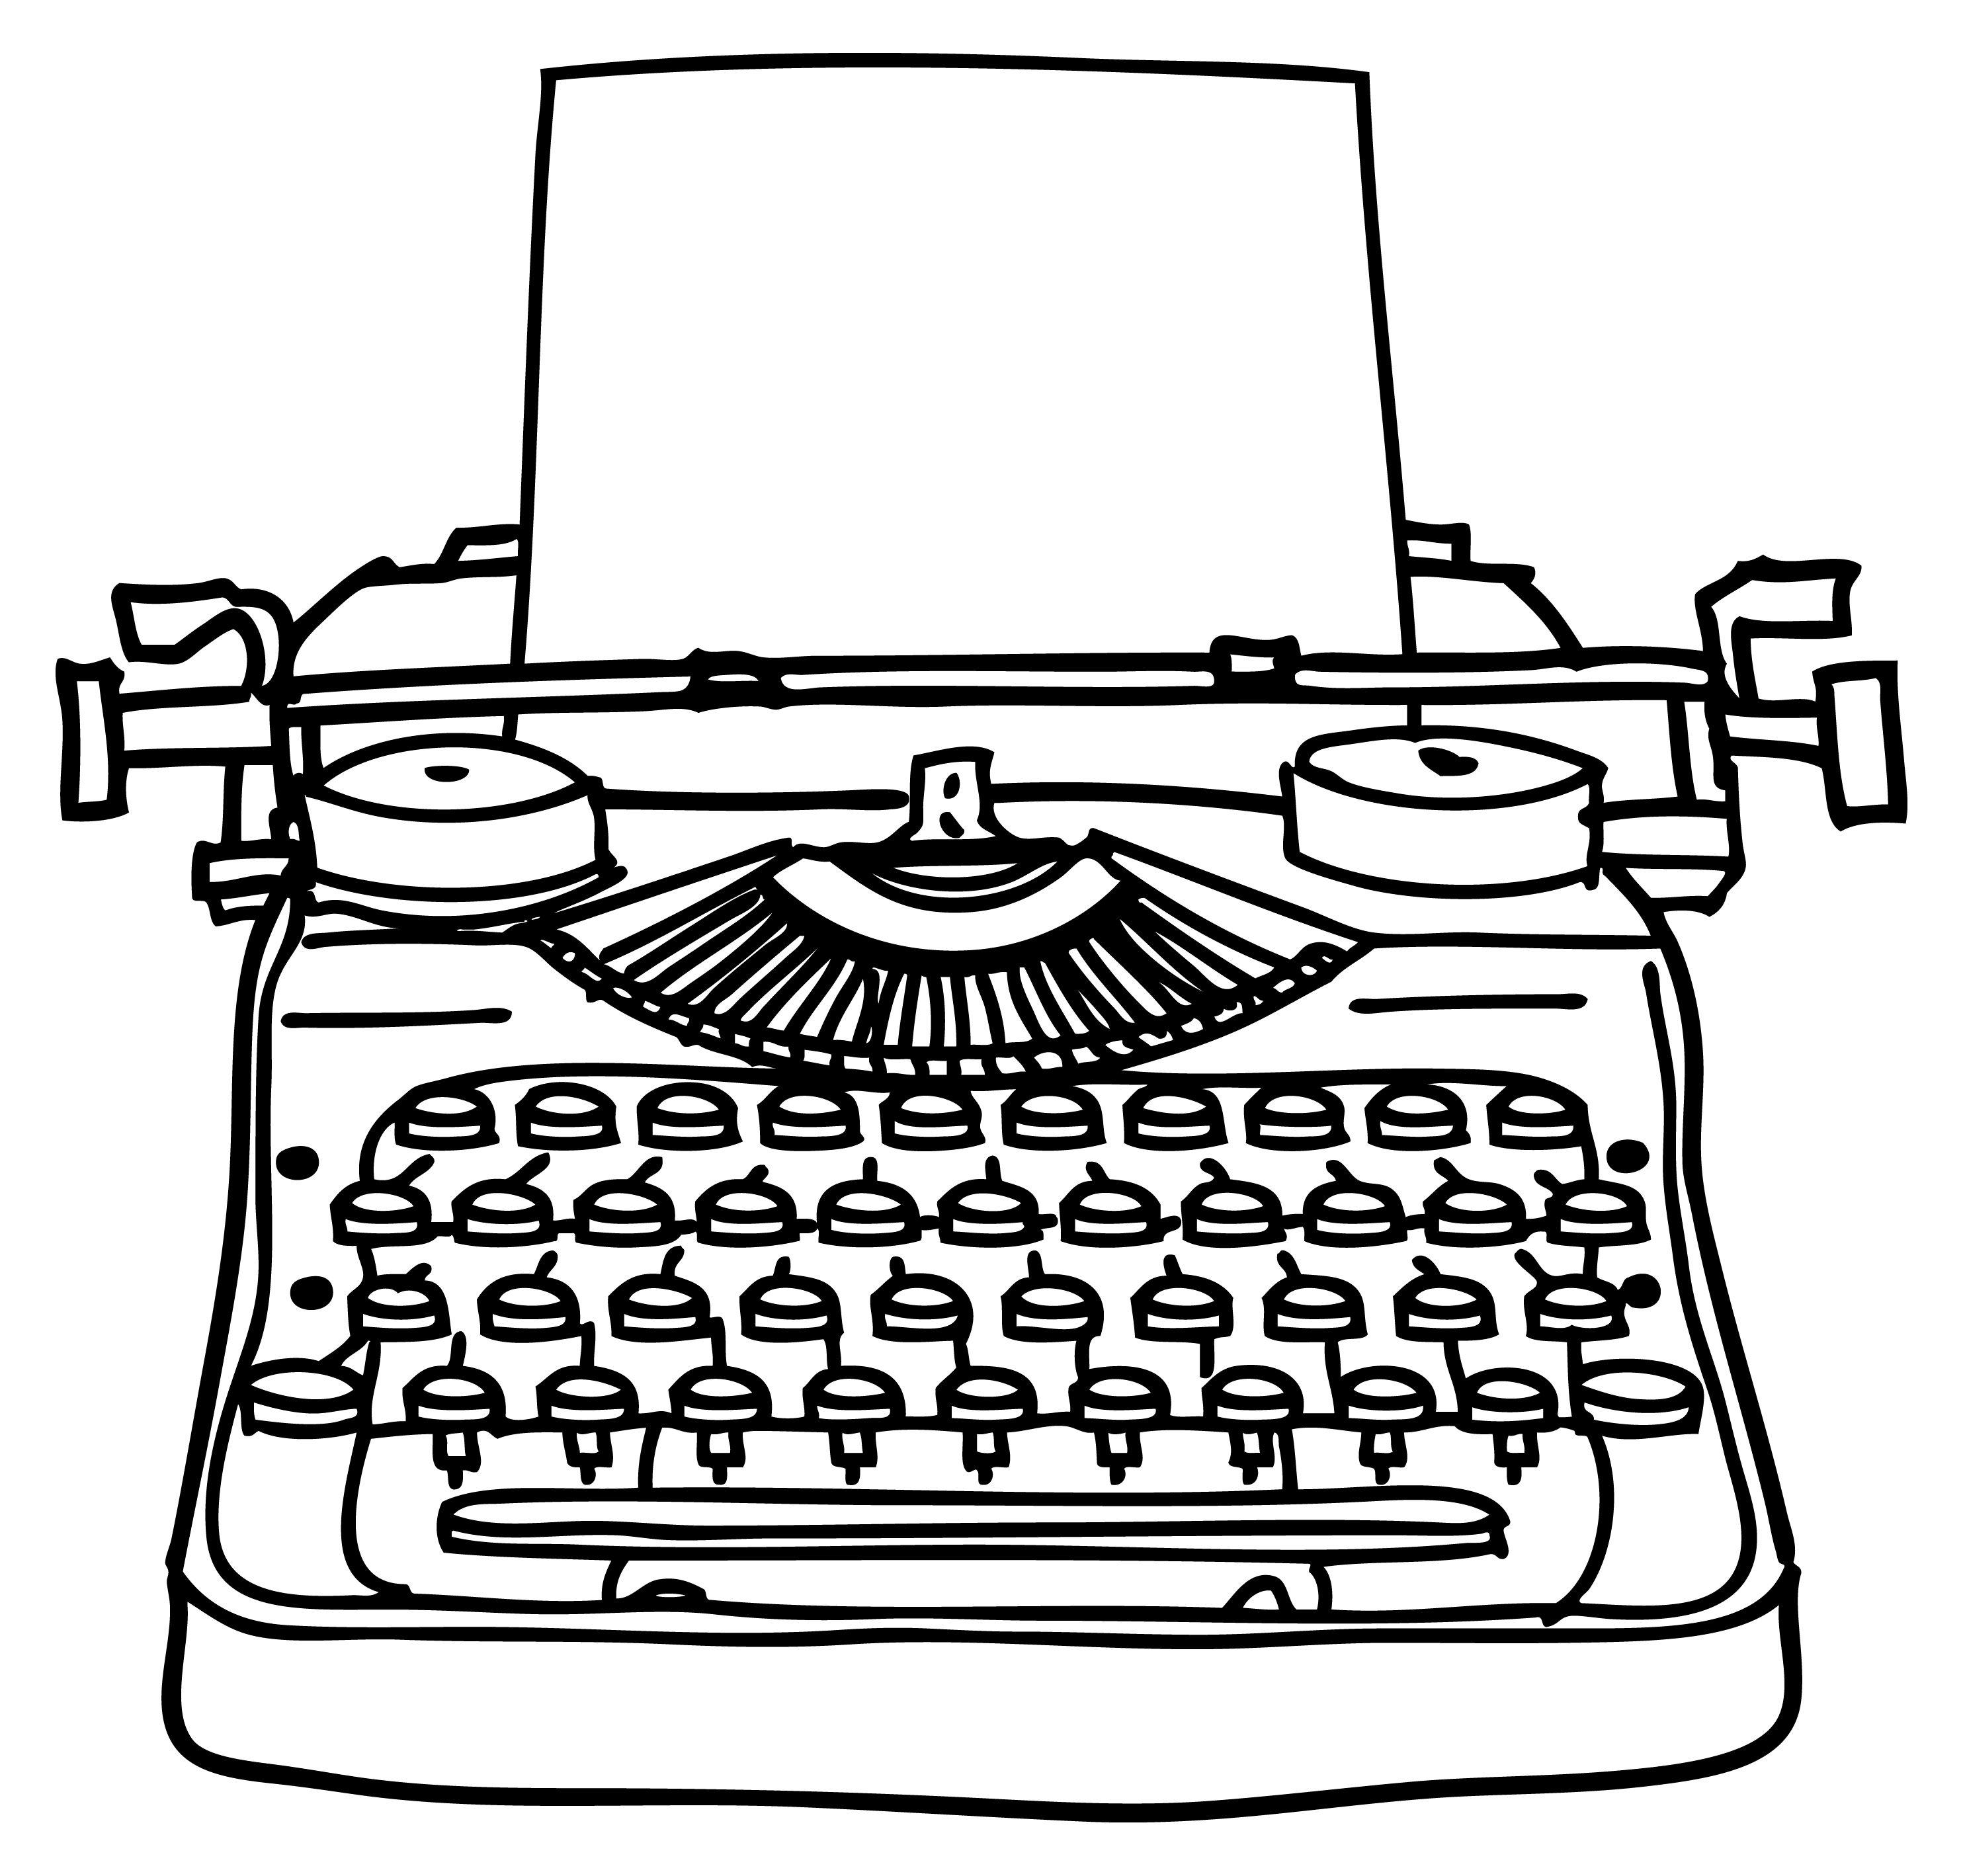 Typewriet clipart clipart download old typewriter clip art - Google Search | Typewriter & keys ... clipart download